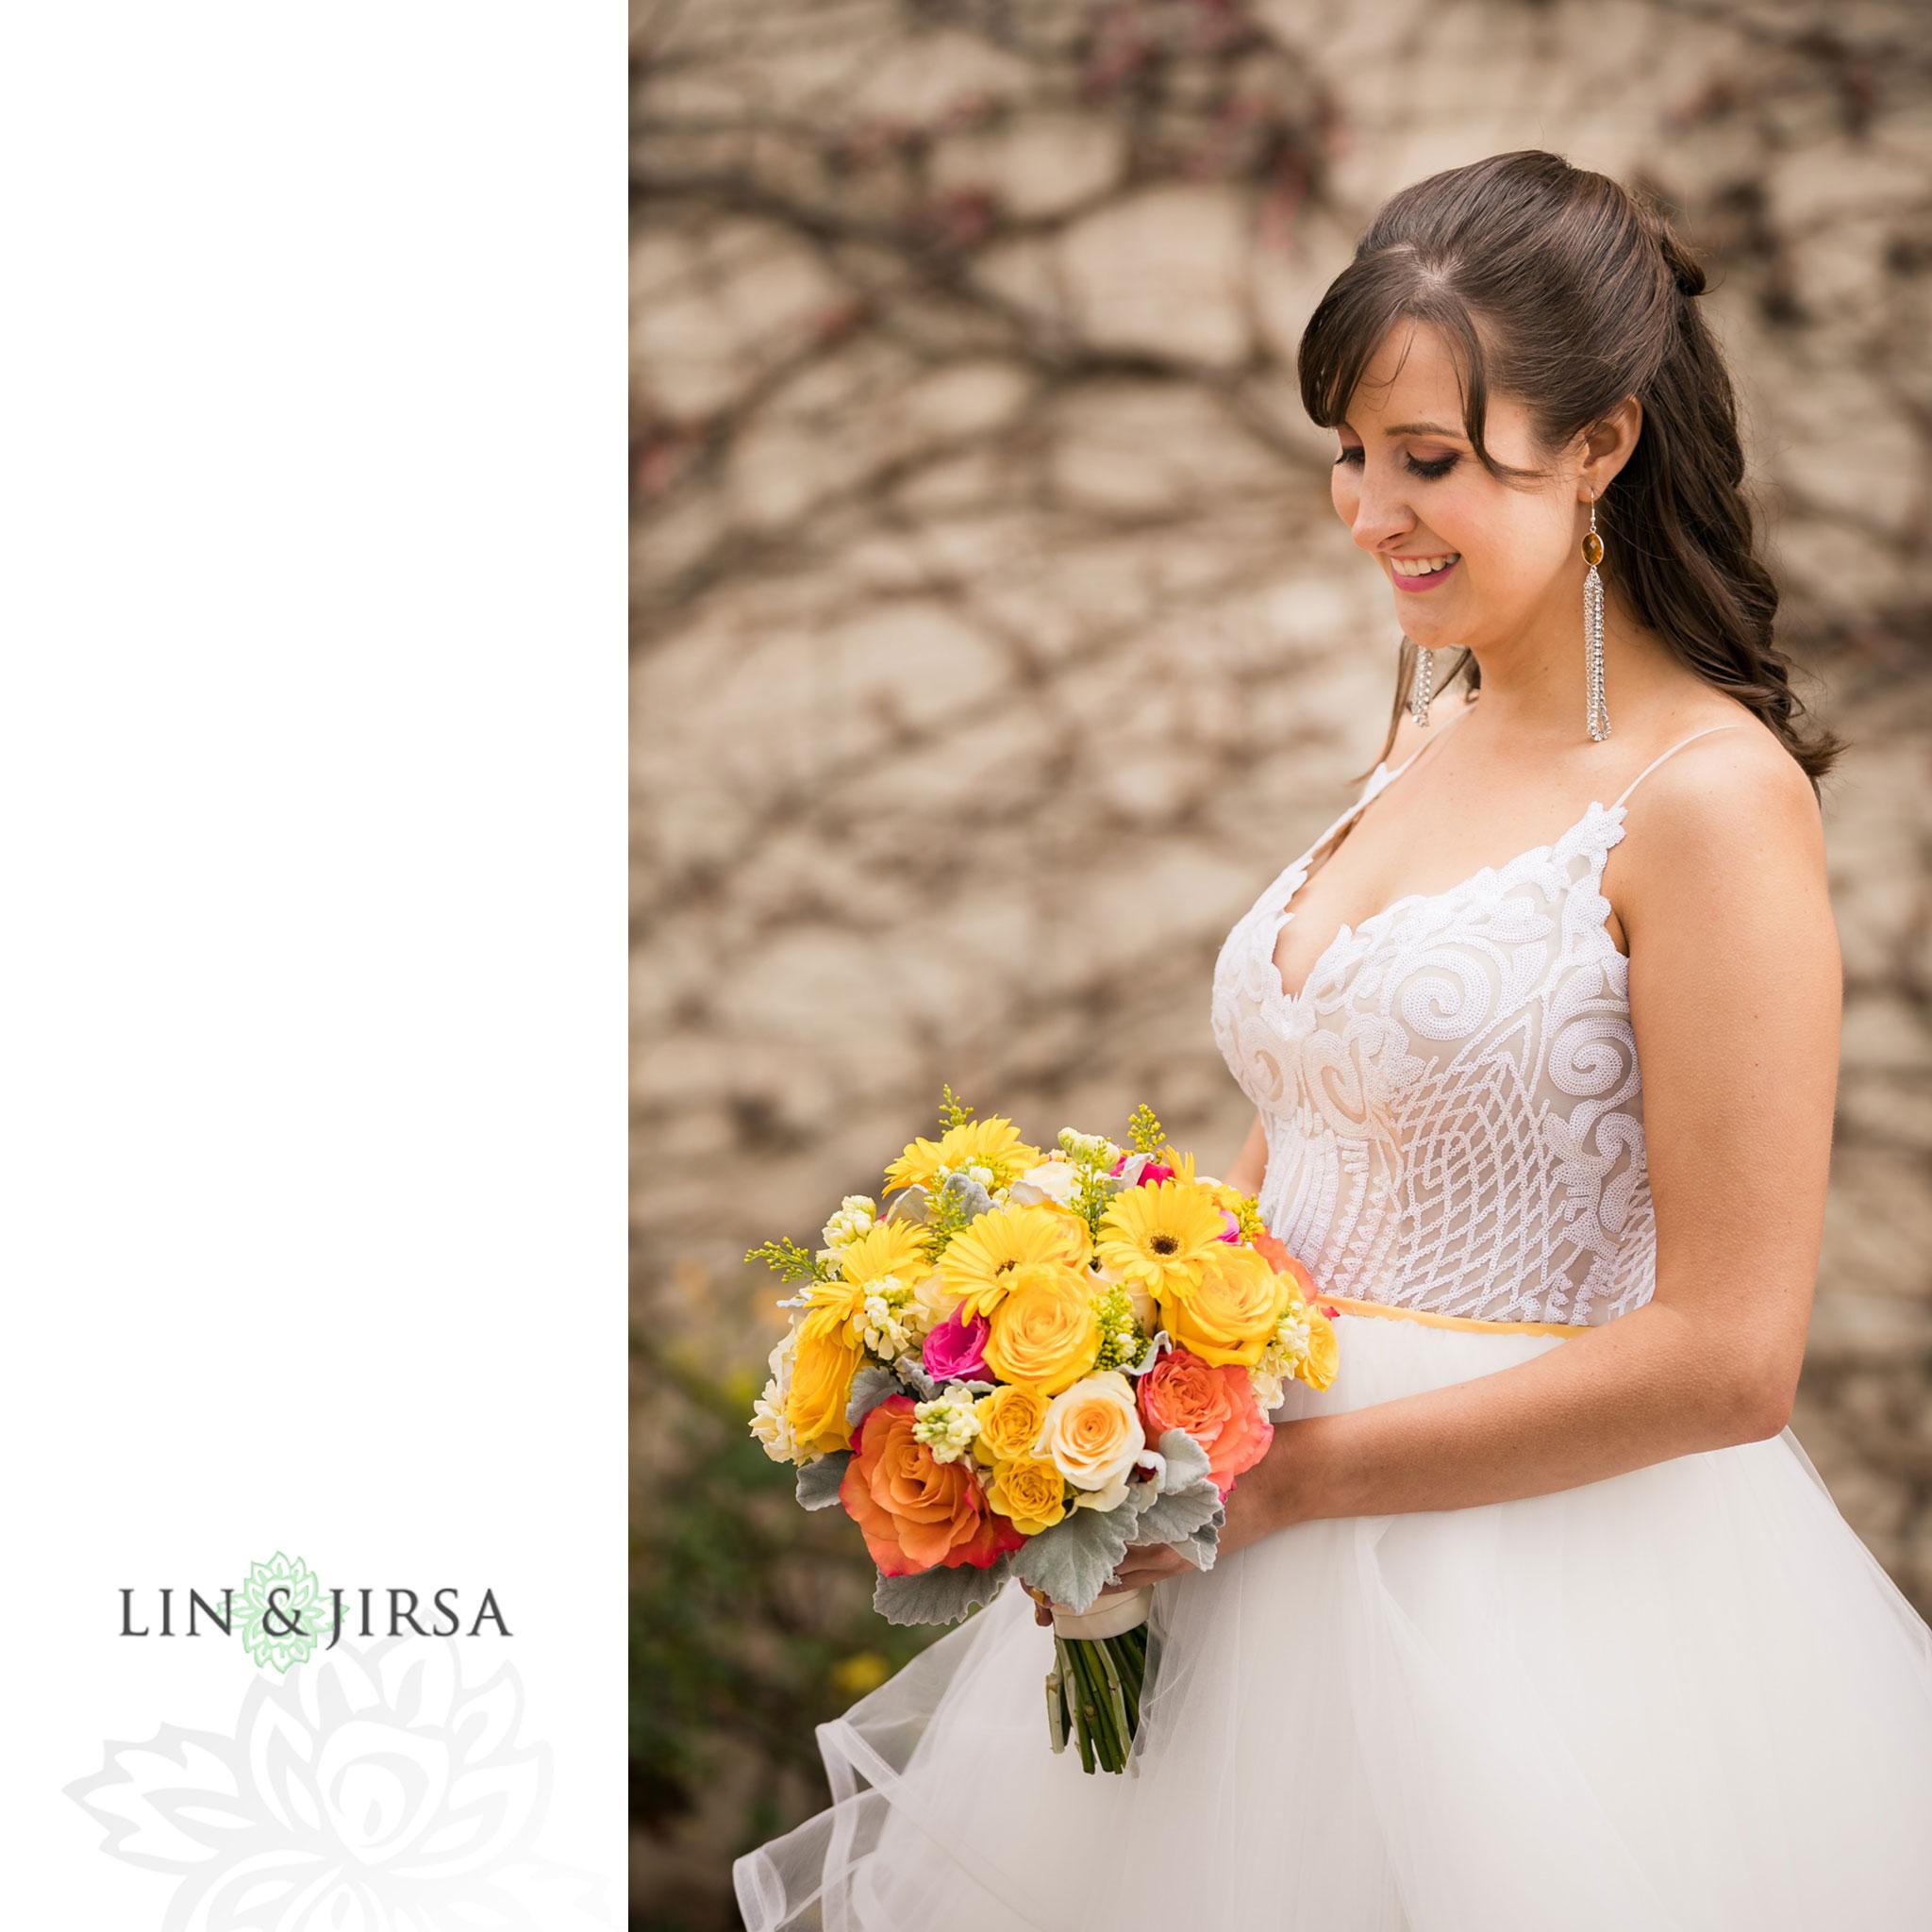 04 leoness cellars temecula bride wedding photography